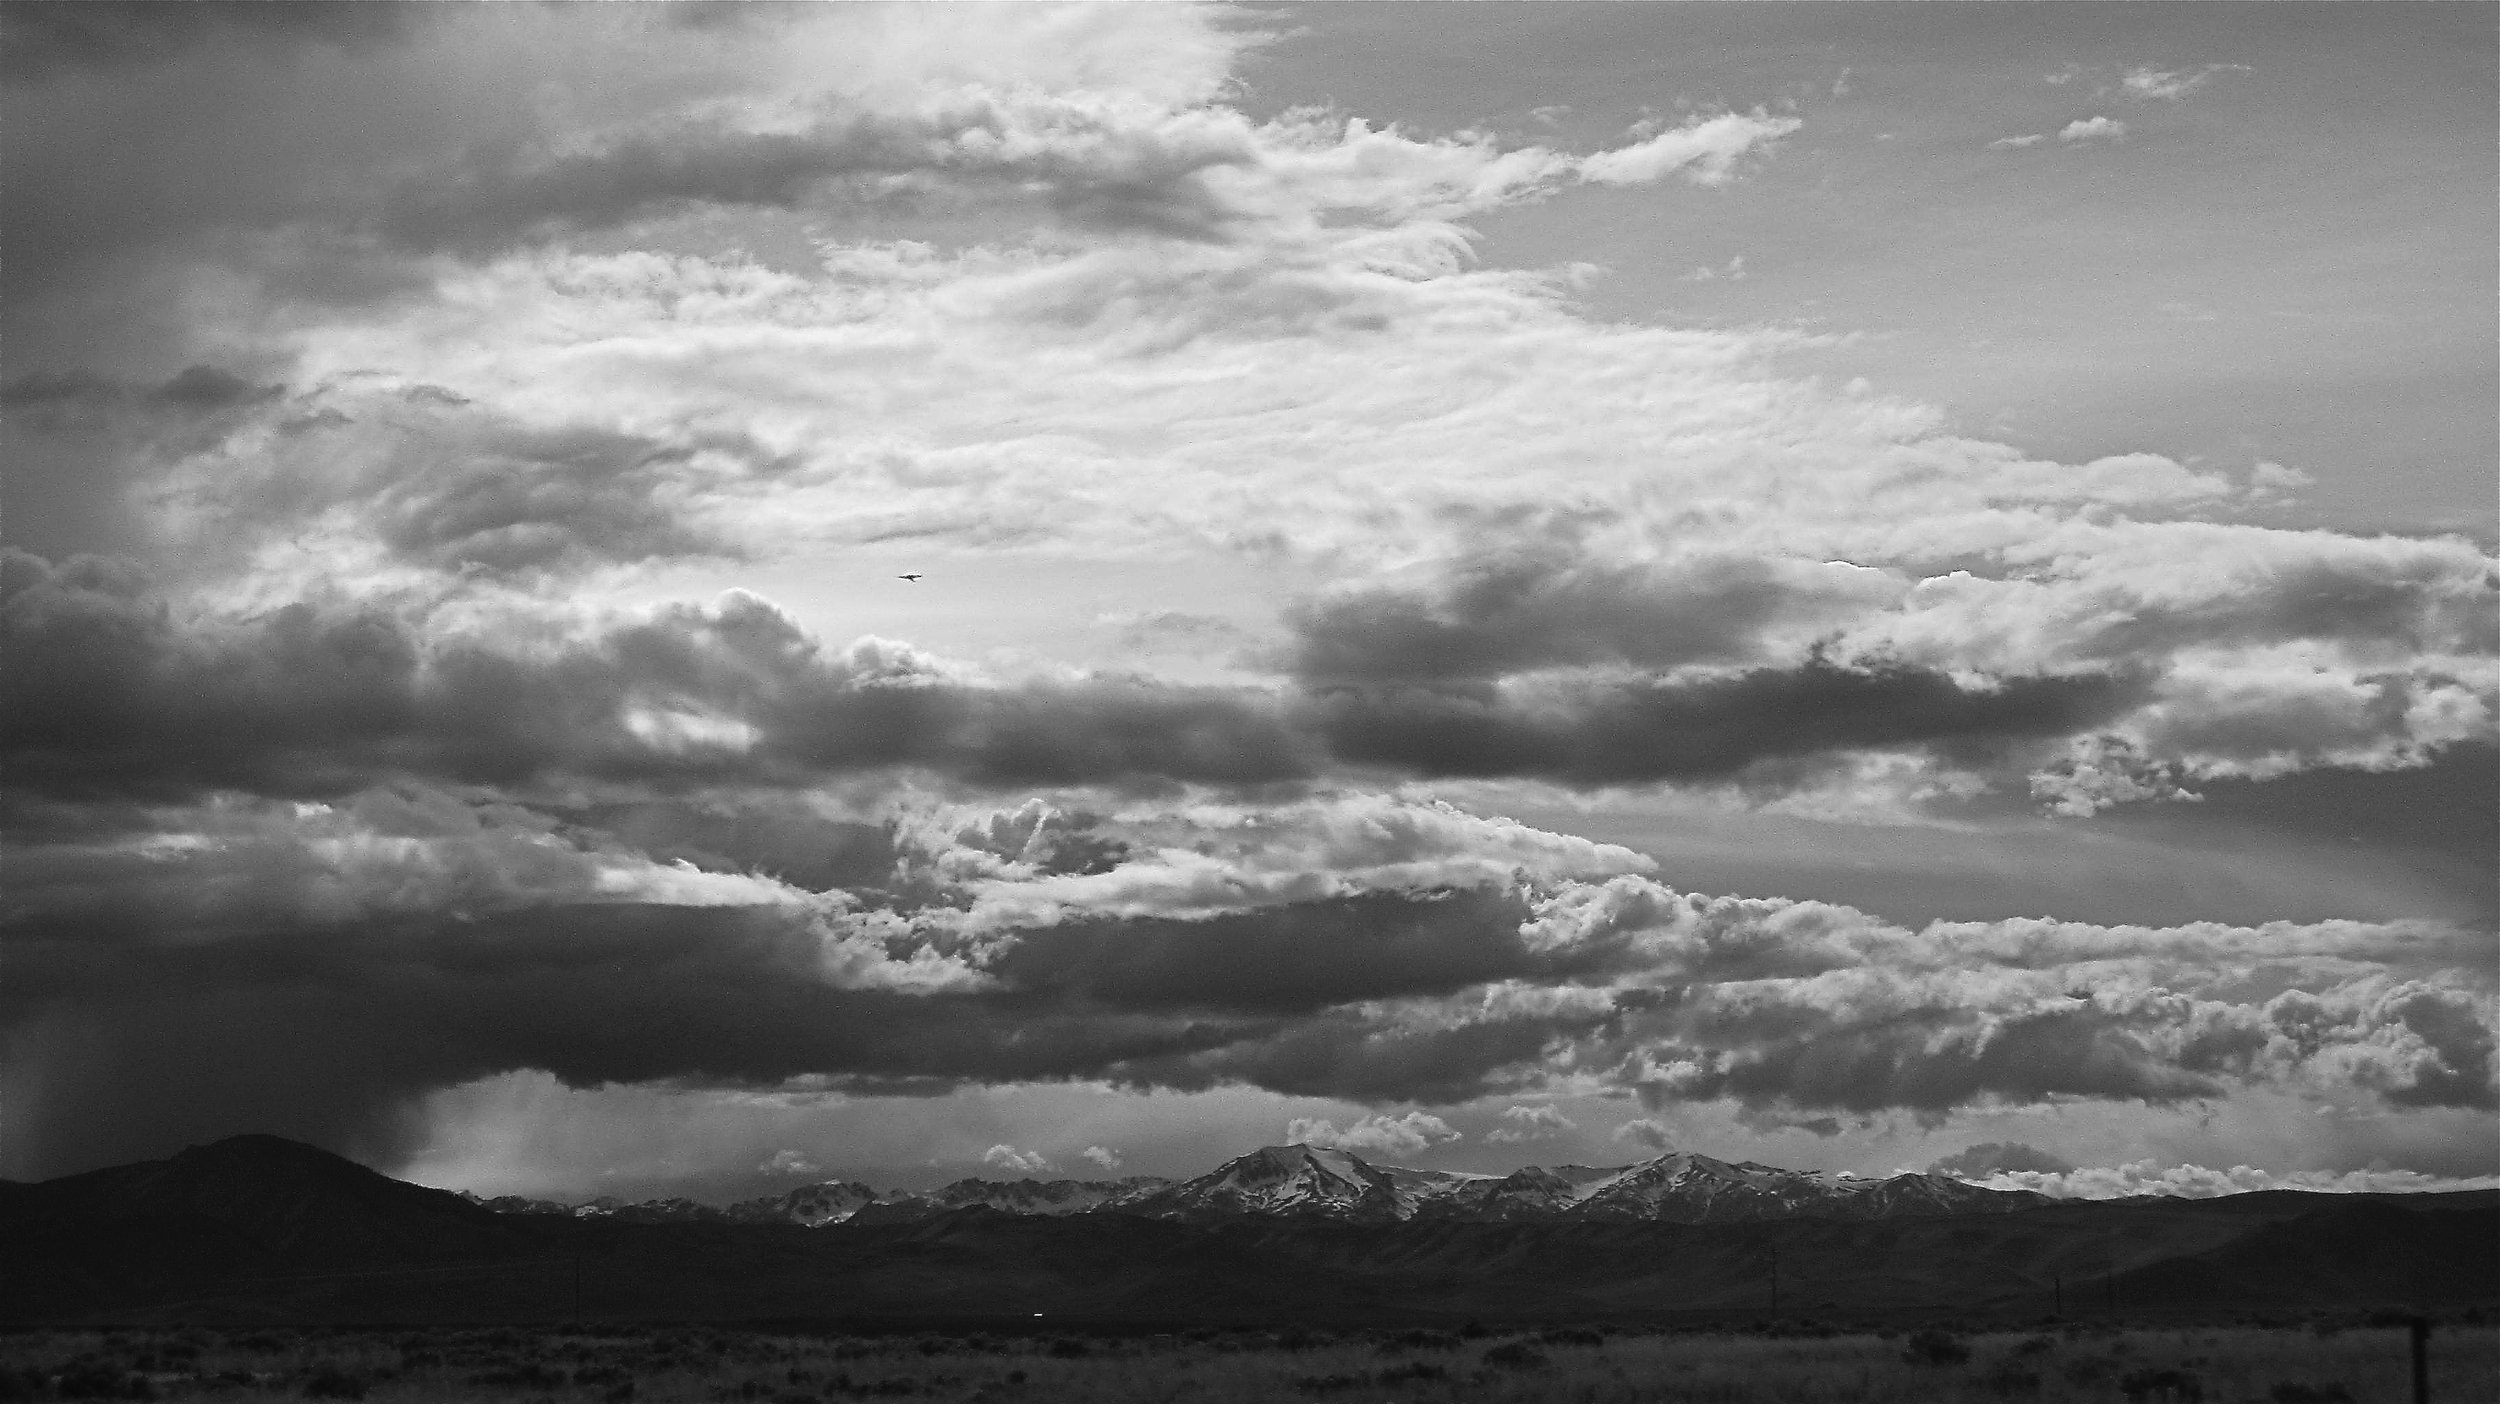 Montana Mountain & Sky BW Is 55-8-9.JPG